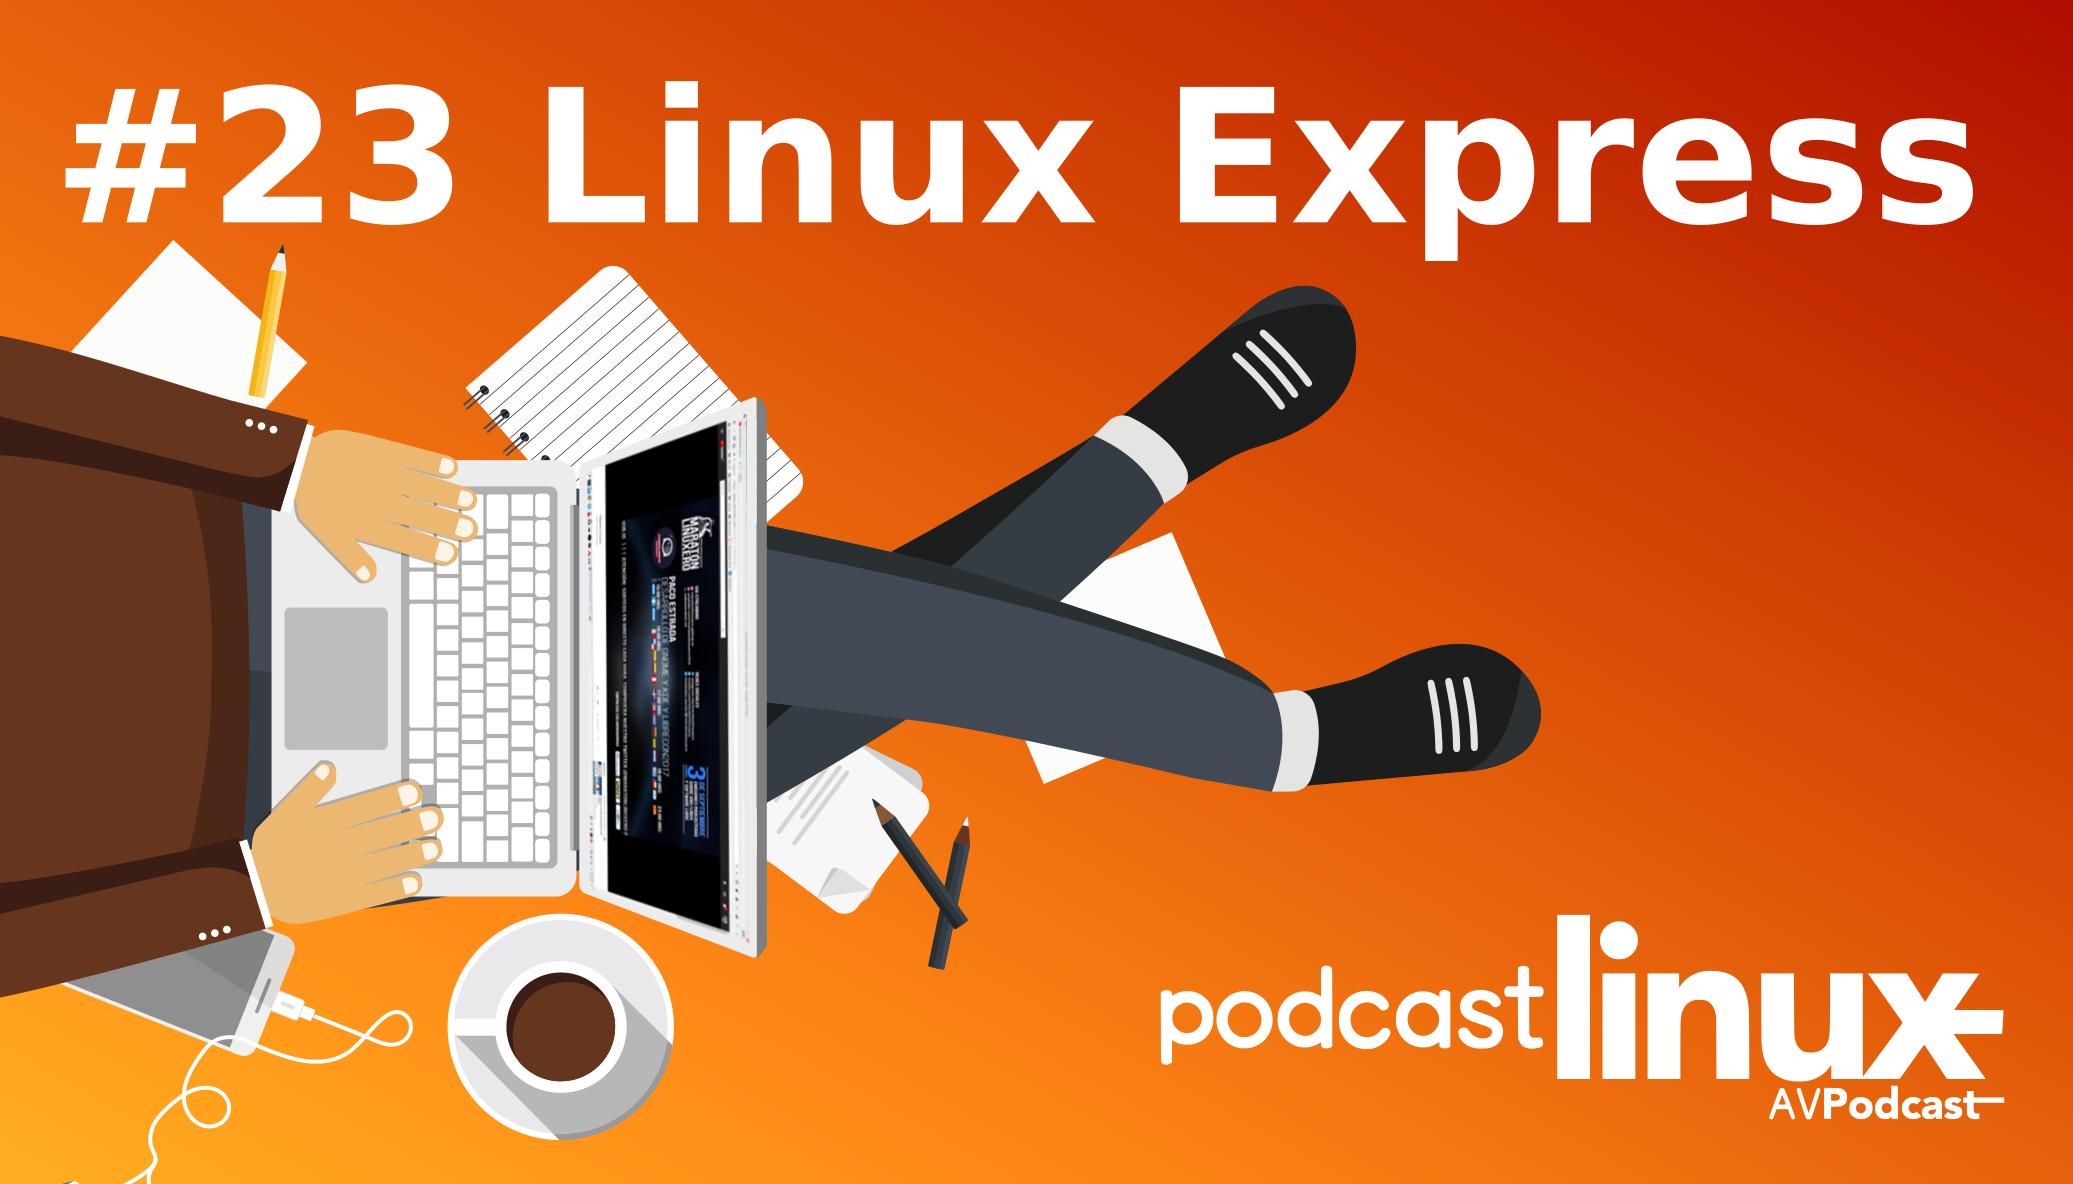 #23 Linux Express